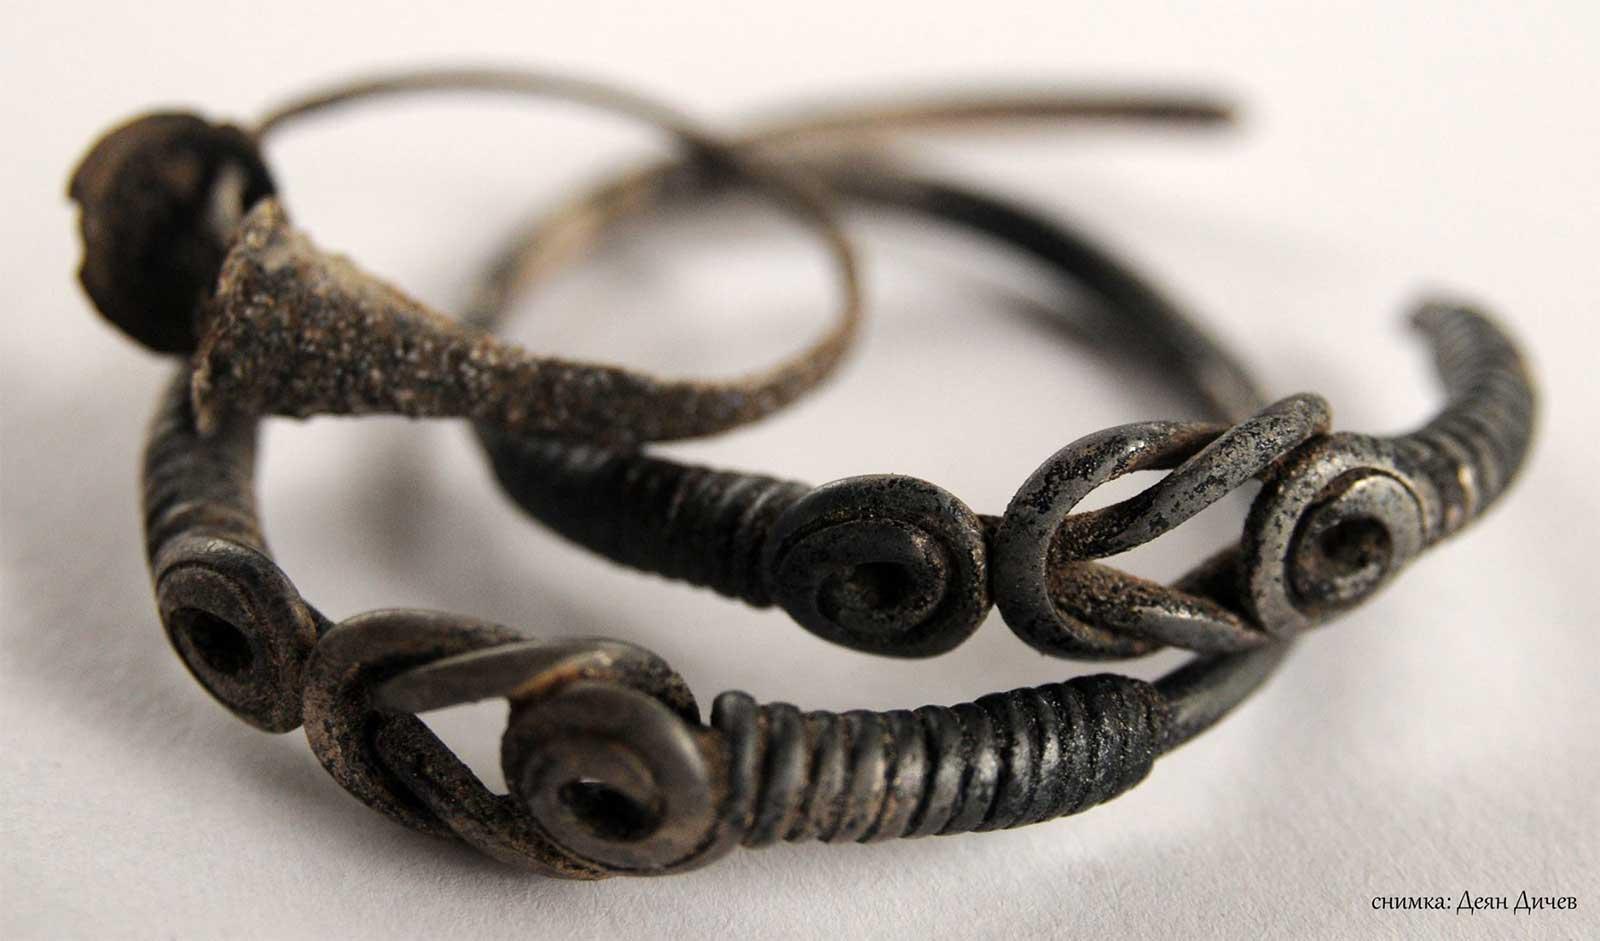 Откриха съкровище край село Бродилово, намериха монети и накити